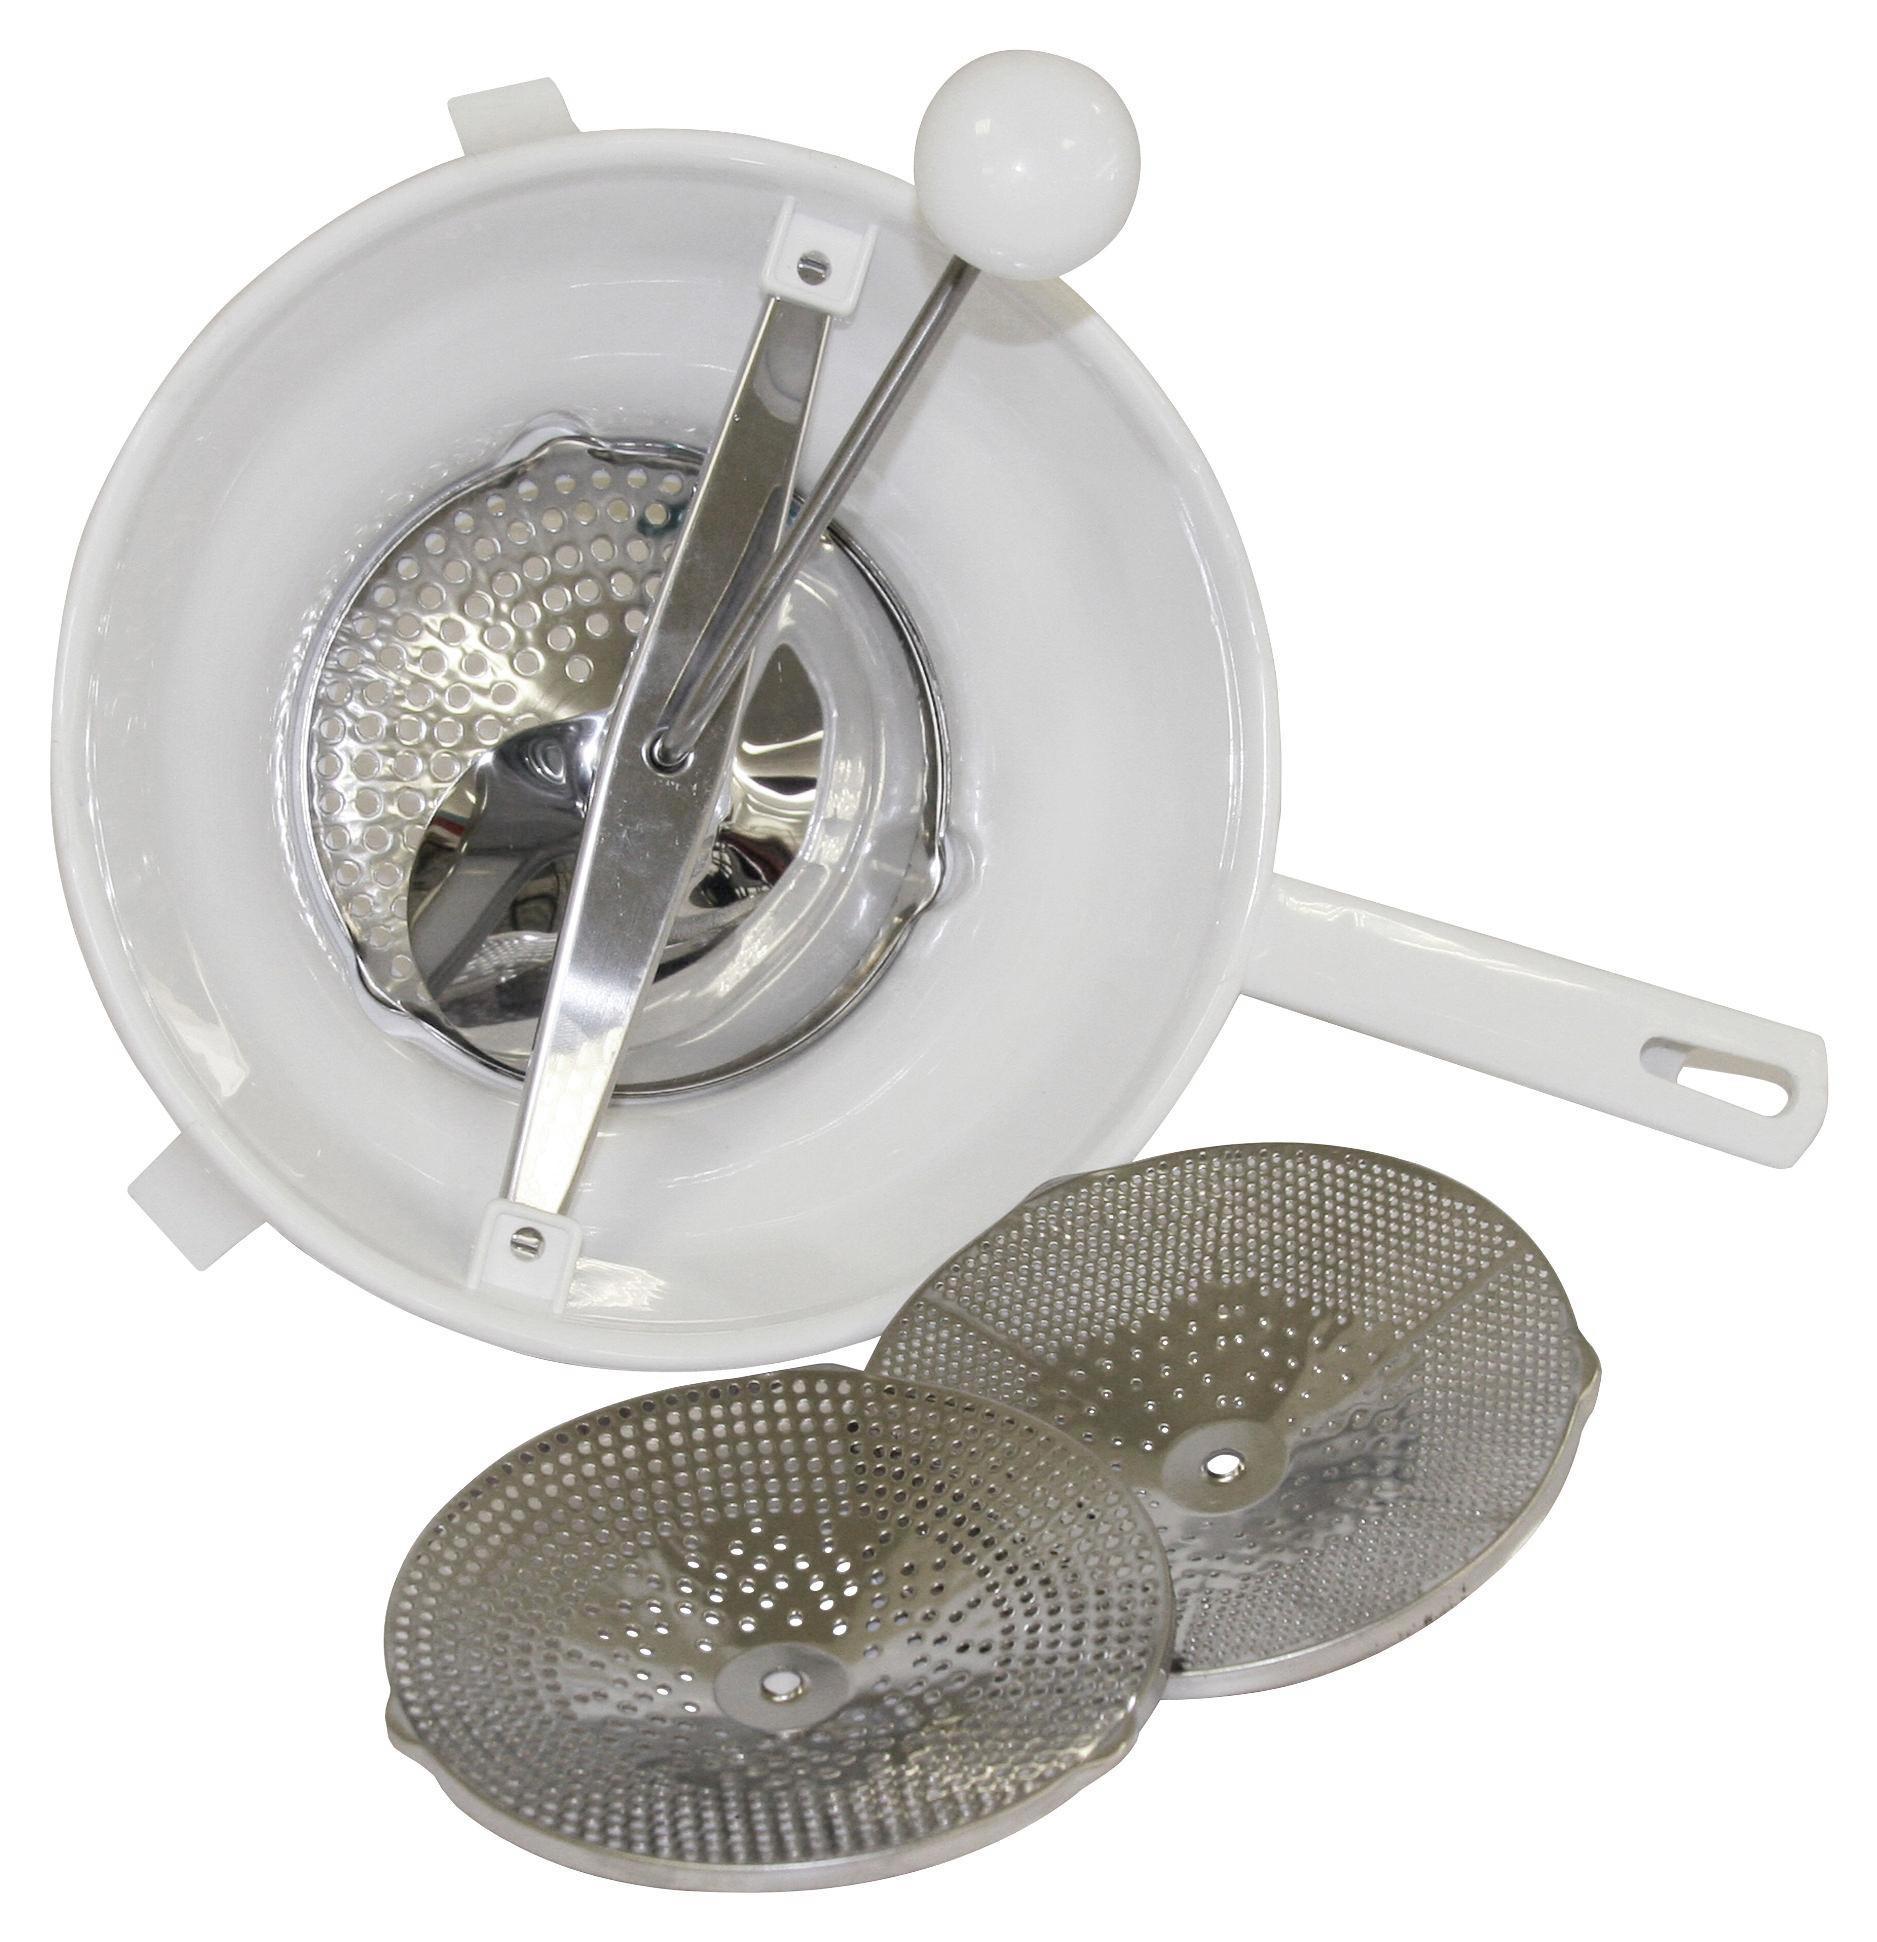 Passiergerät Ø 24 cm - Weiß, MODERN, Kunststoff (36/26/18cm)